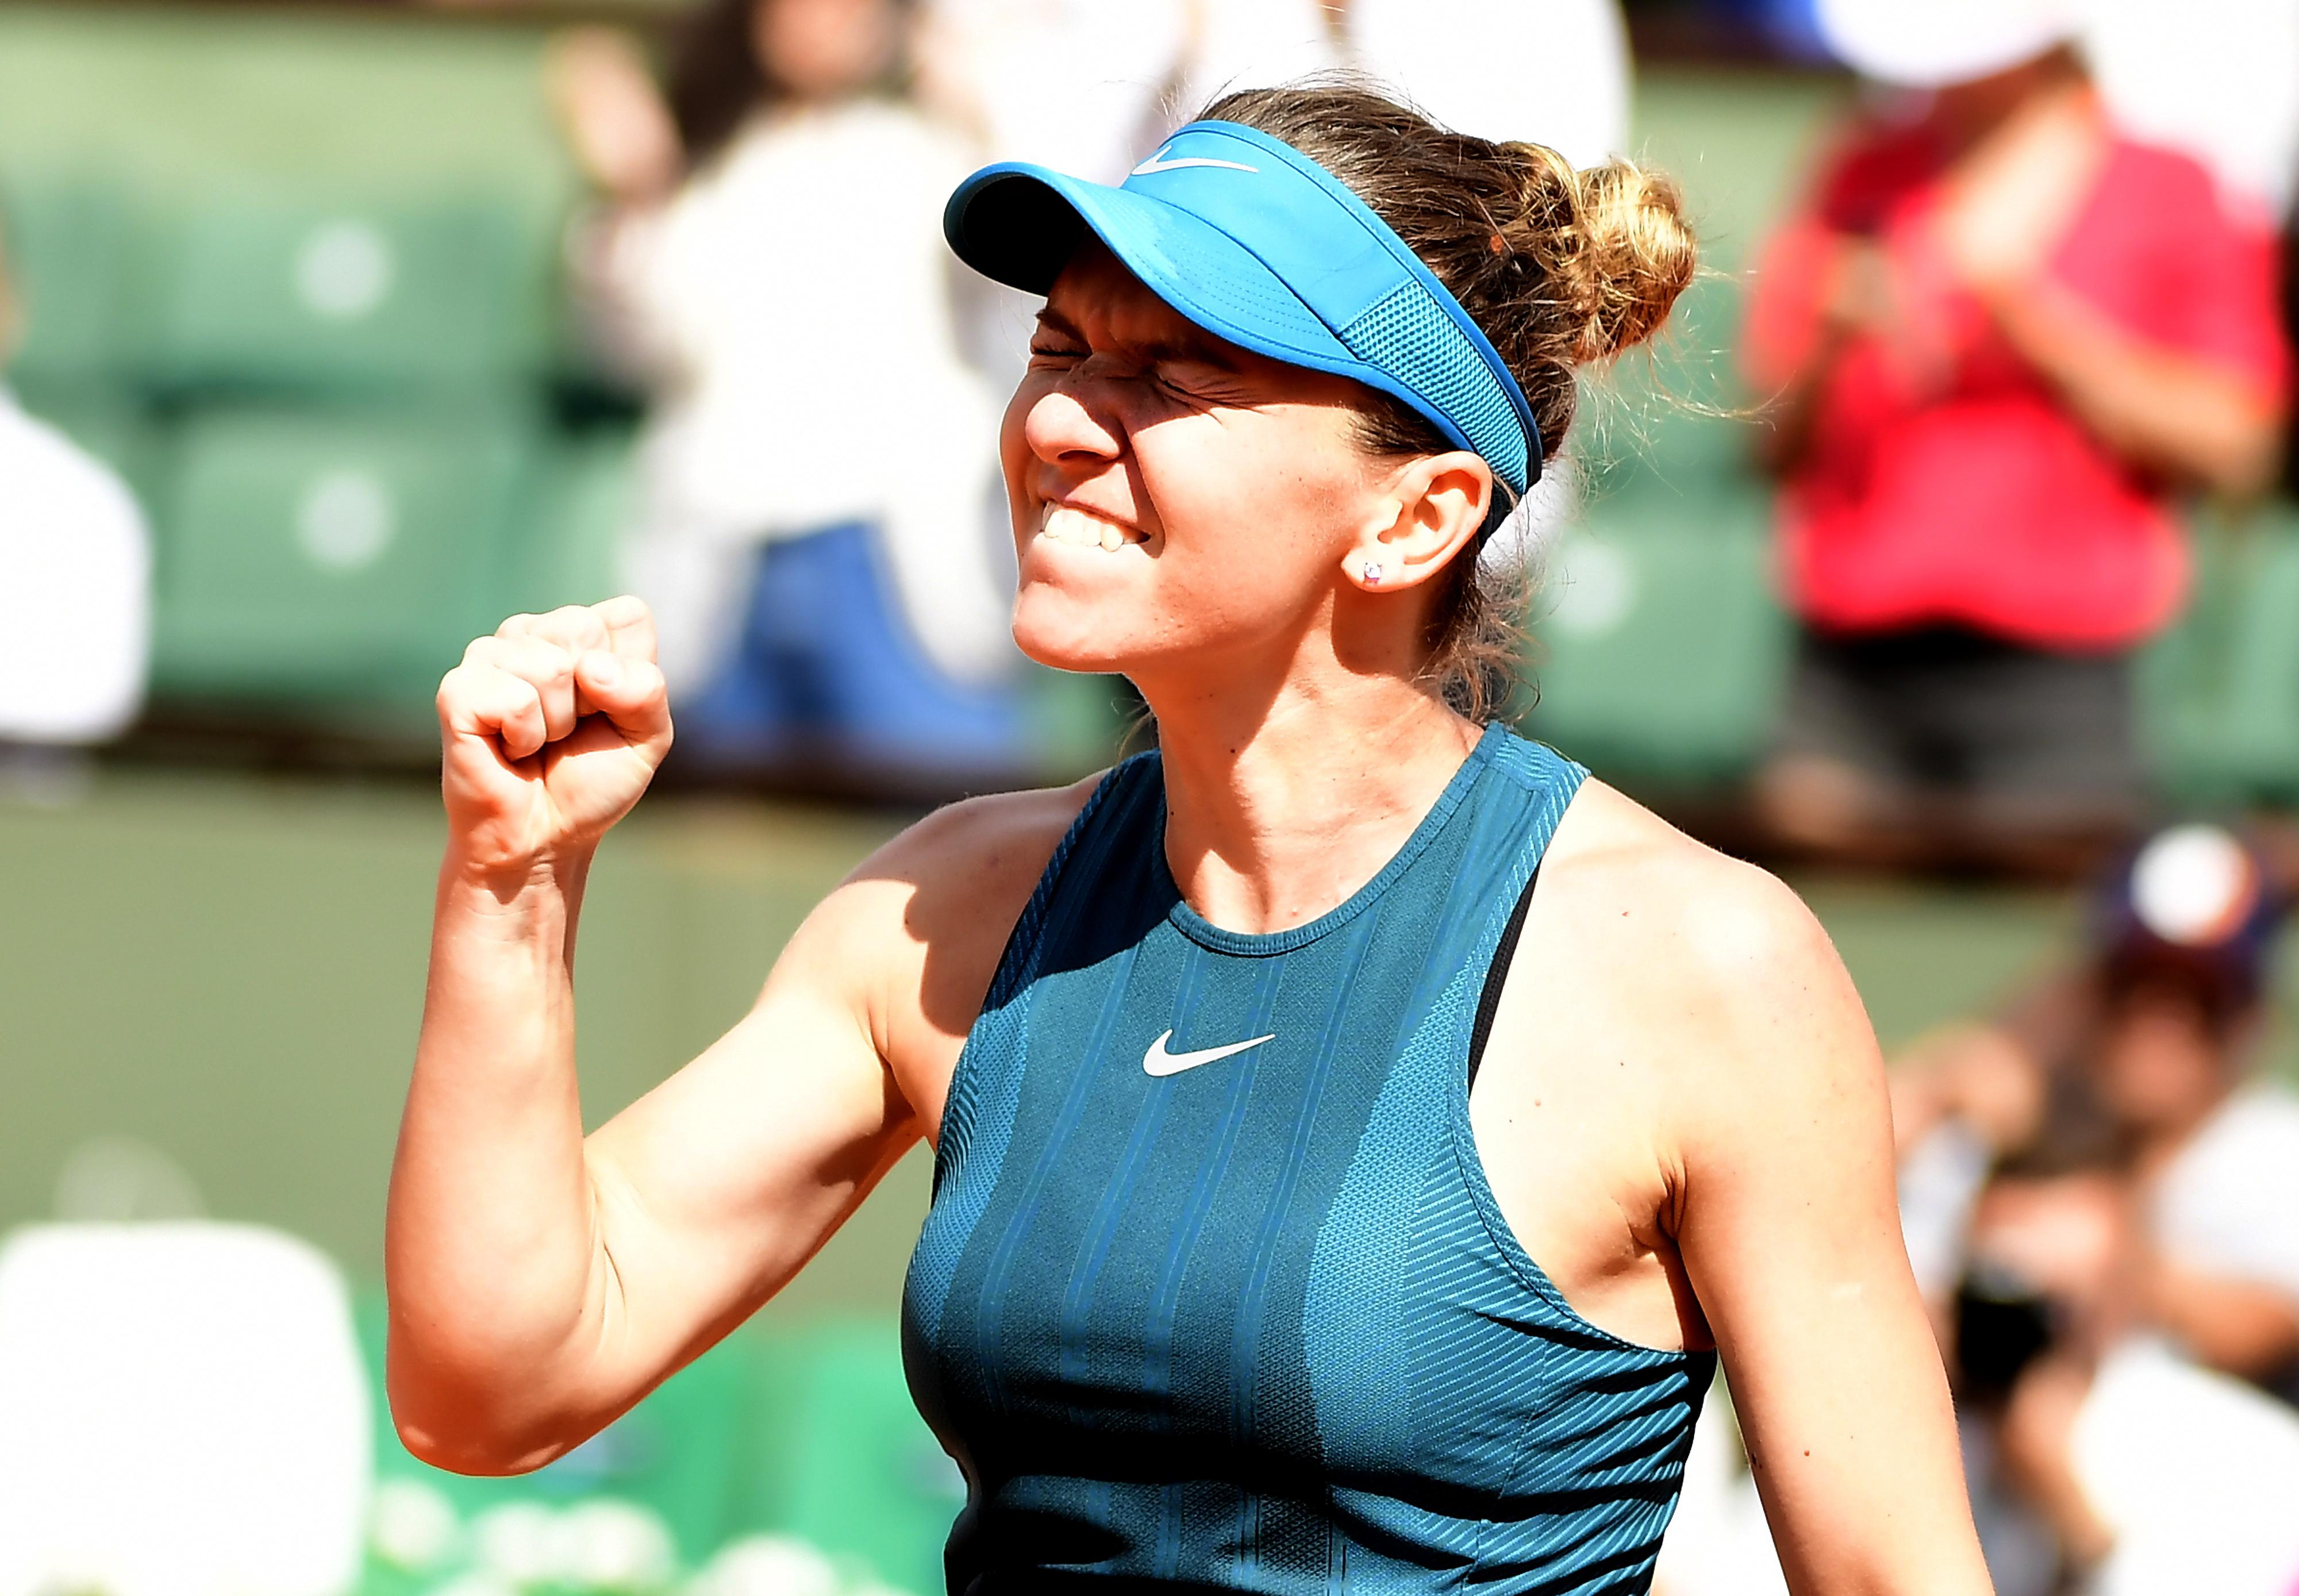 Simona Halep celebrates after destroying Garbine Muguruza in the French Open semi-final